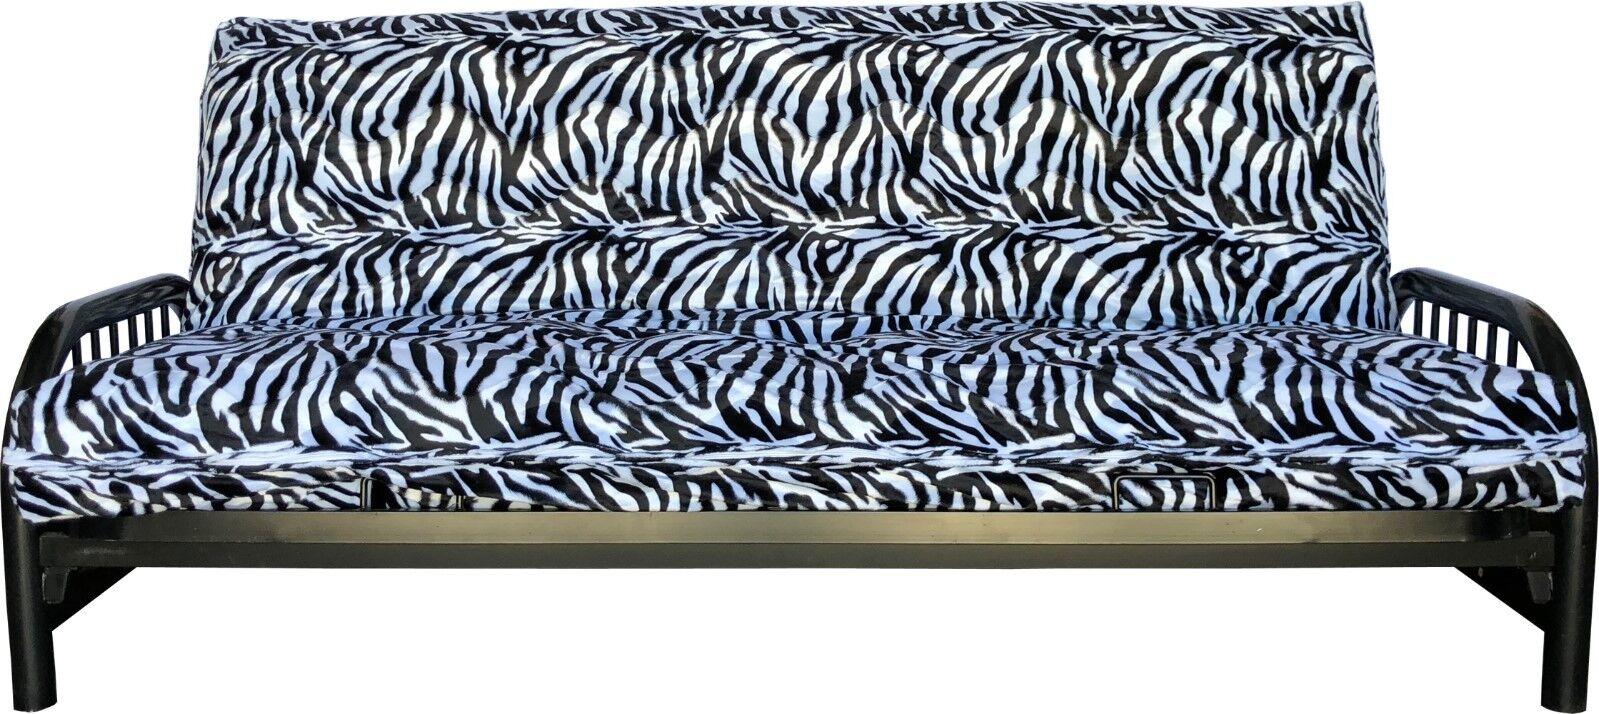 Zebra Skin Velvet Queen Size Futon